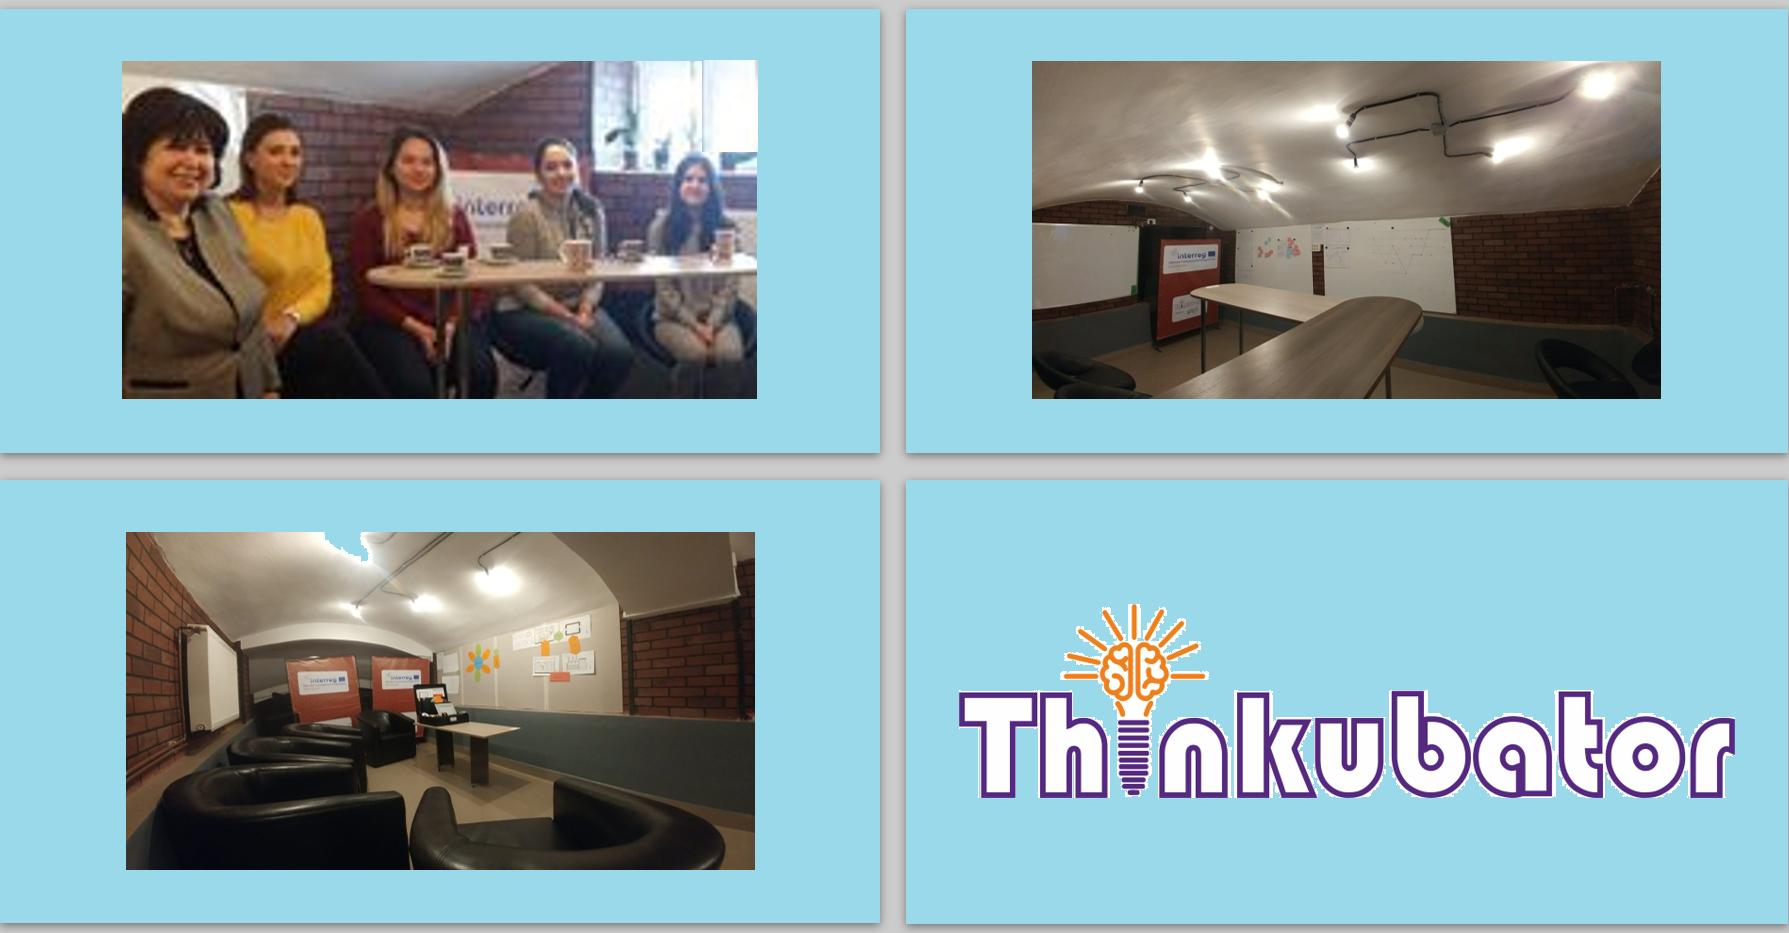 Thinkcubator_compilation